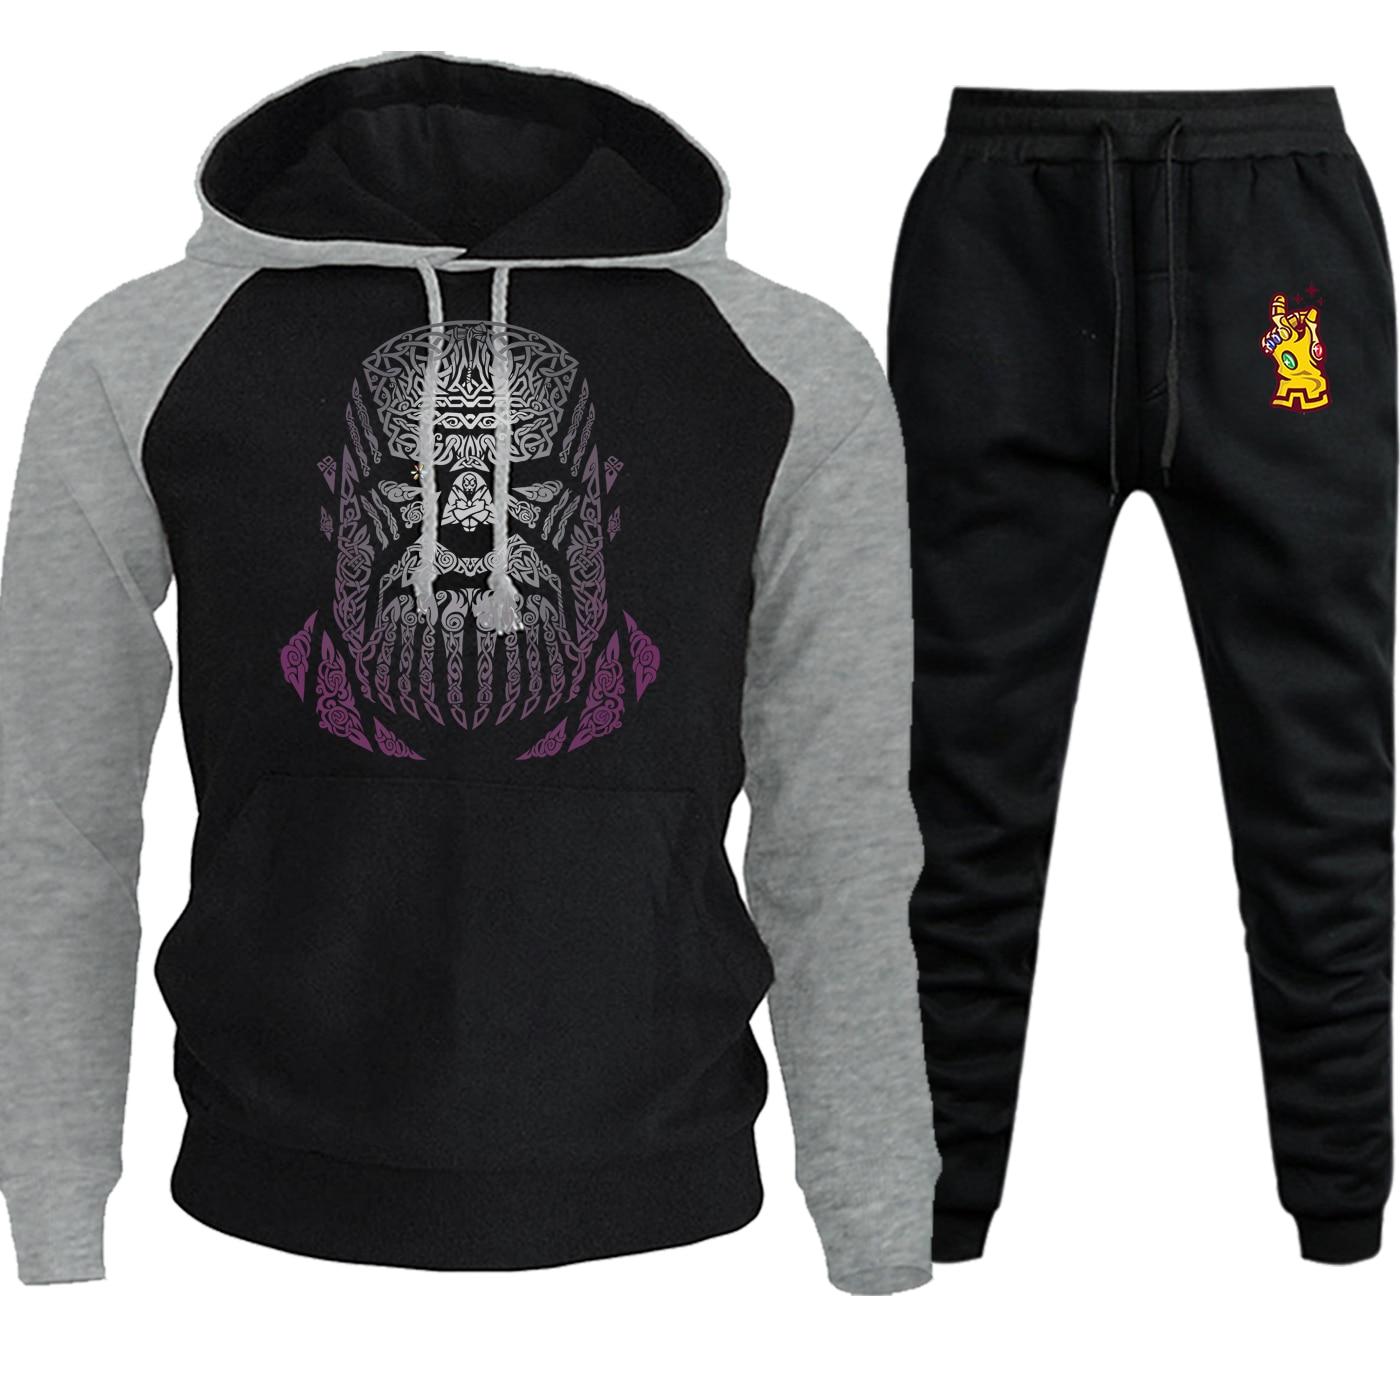 Thanos Printed Raglan Hoodies Mens The Avngers Streetwear Autumn Winter Casual Hoody Fleece Suit Male Pullover+Pants 2 Piece Set